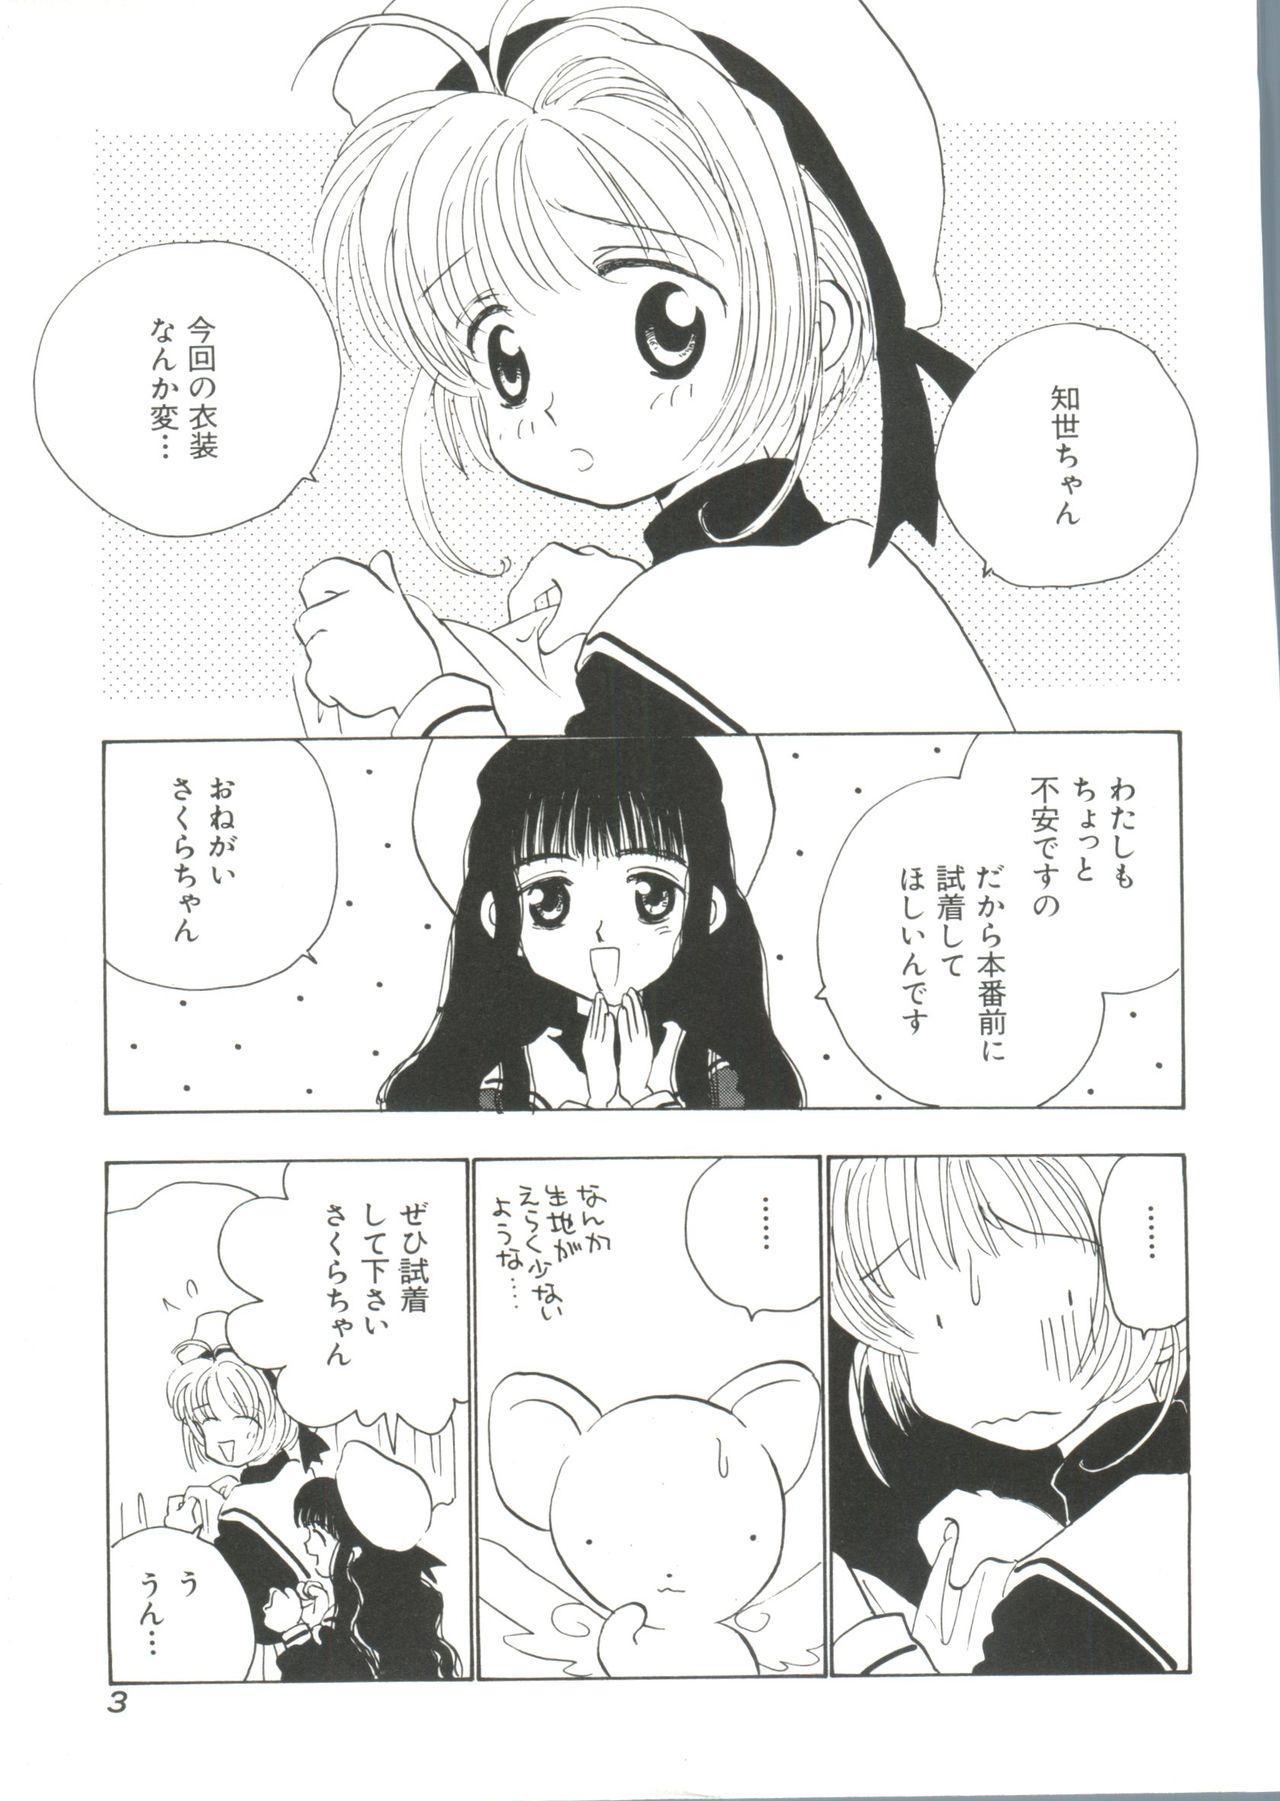 Ero-chan to Issho 4